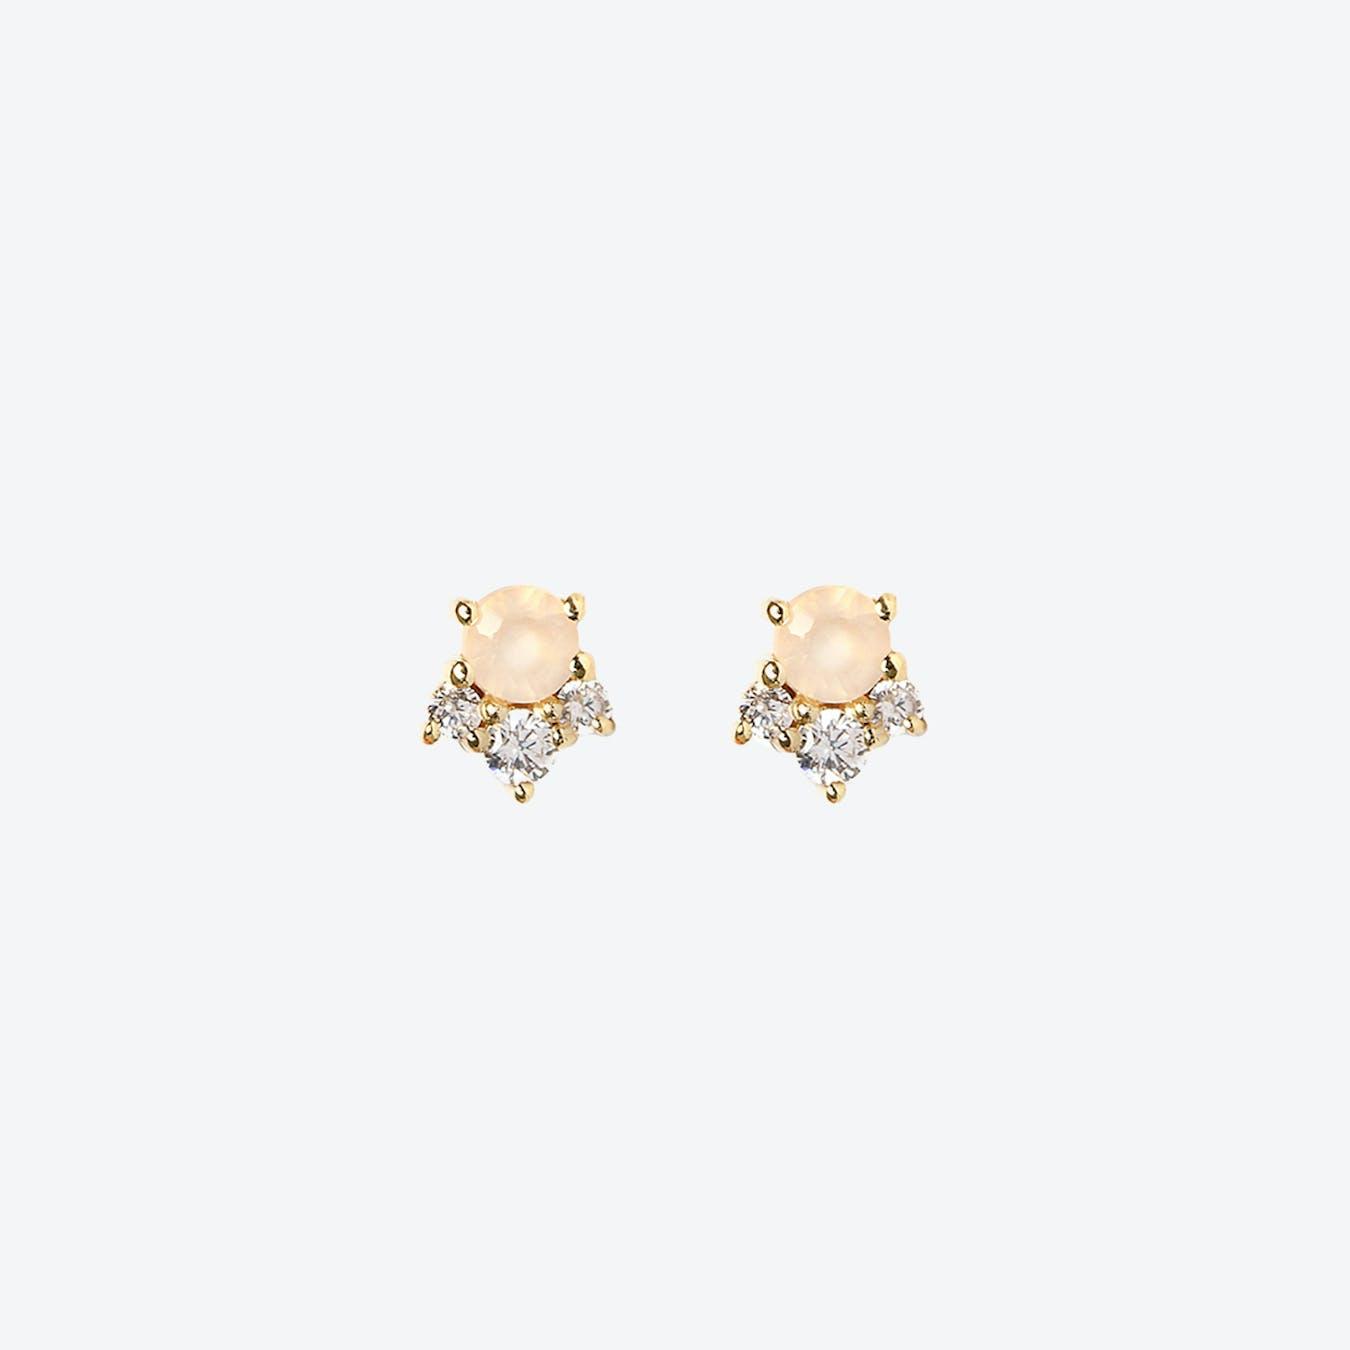 Nahia Earrings - Pink Chalcedony